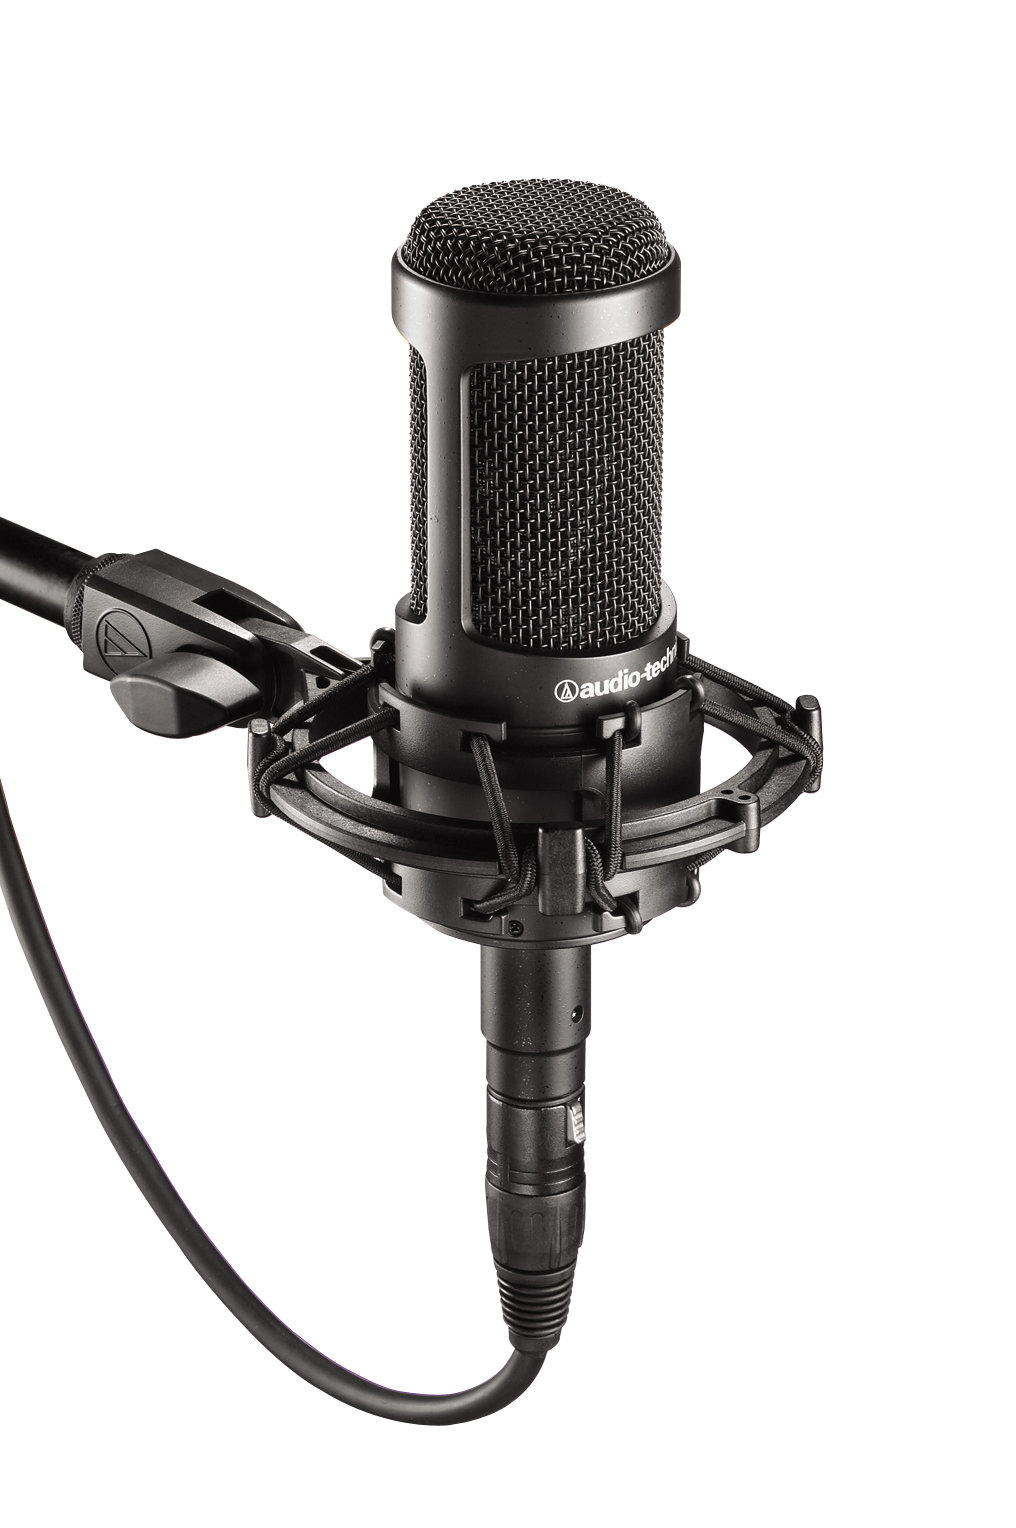 the best studio mics for vocals 100 to 1000 oct 2018 gearank. Black Bedroom Furniture Sets. Home Design Ideas